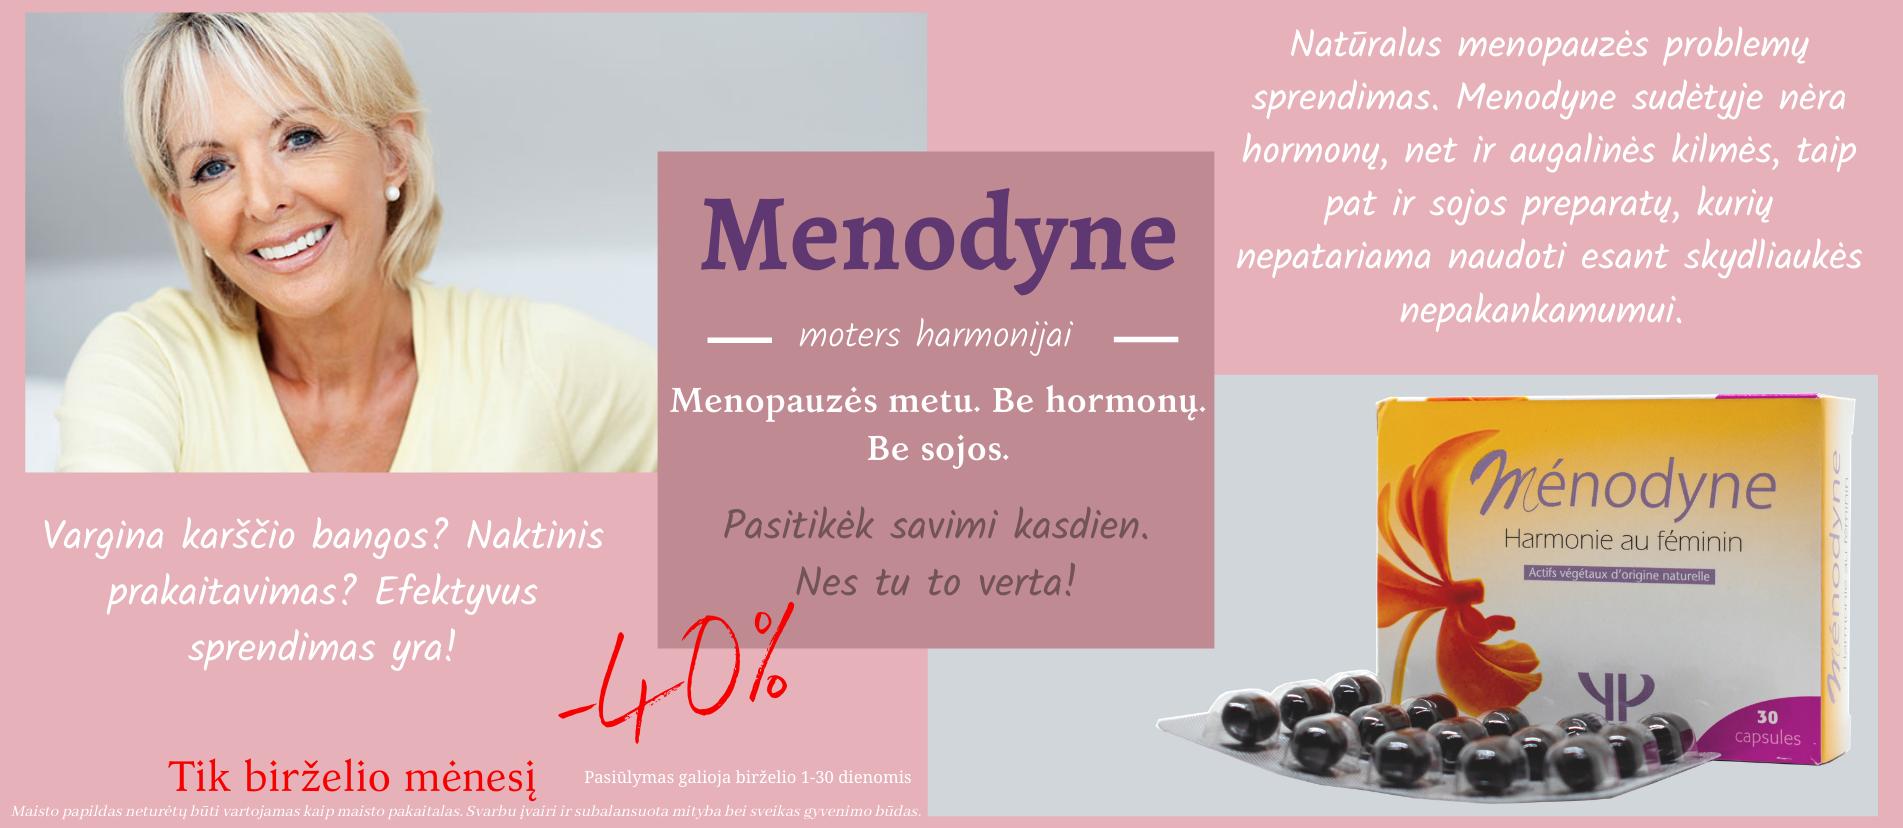 Menodyne-moters-harmonijai_slamutis.lt